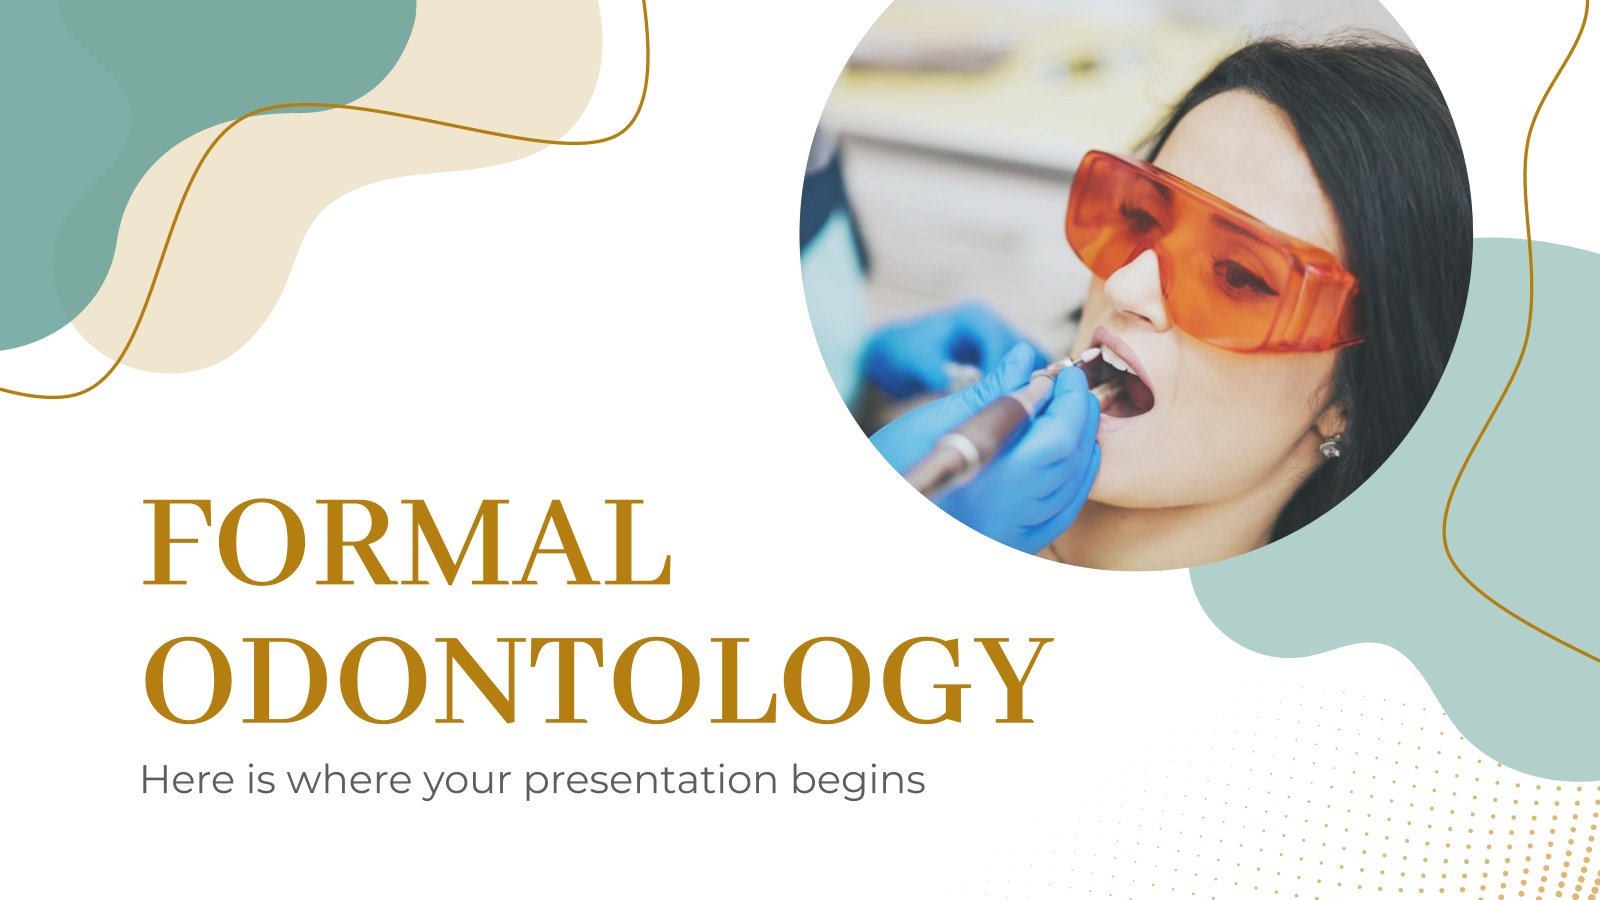 Formal Odontology presentation template